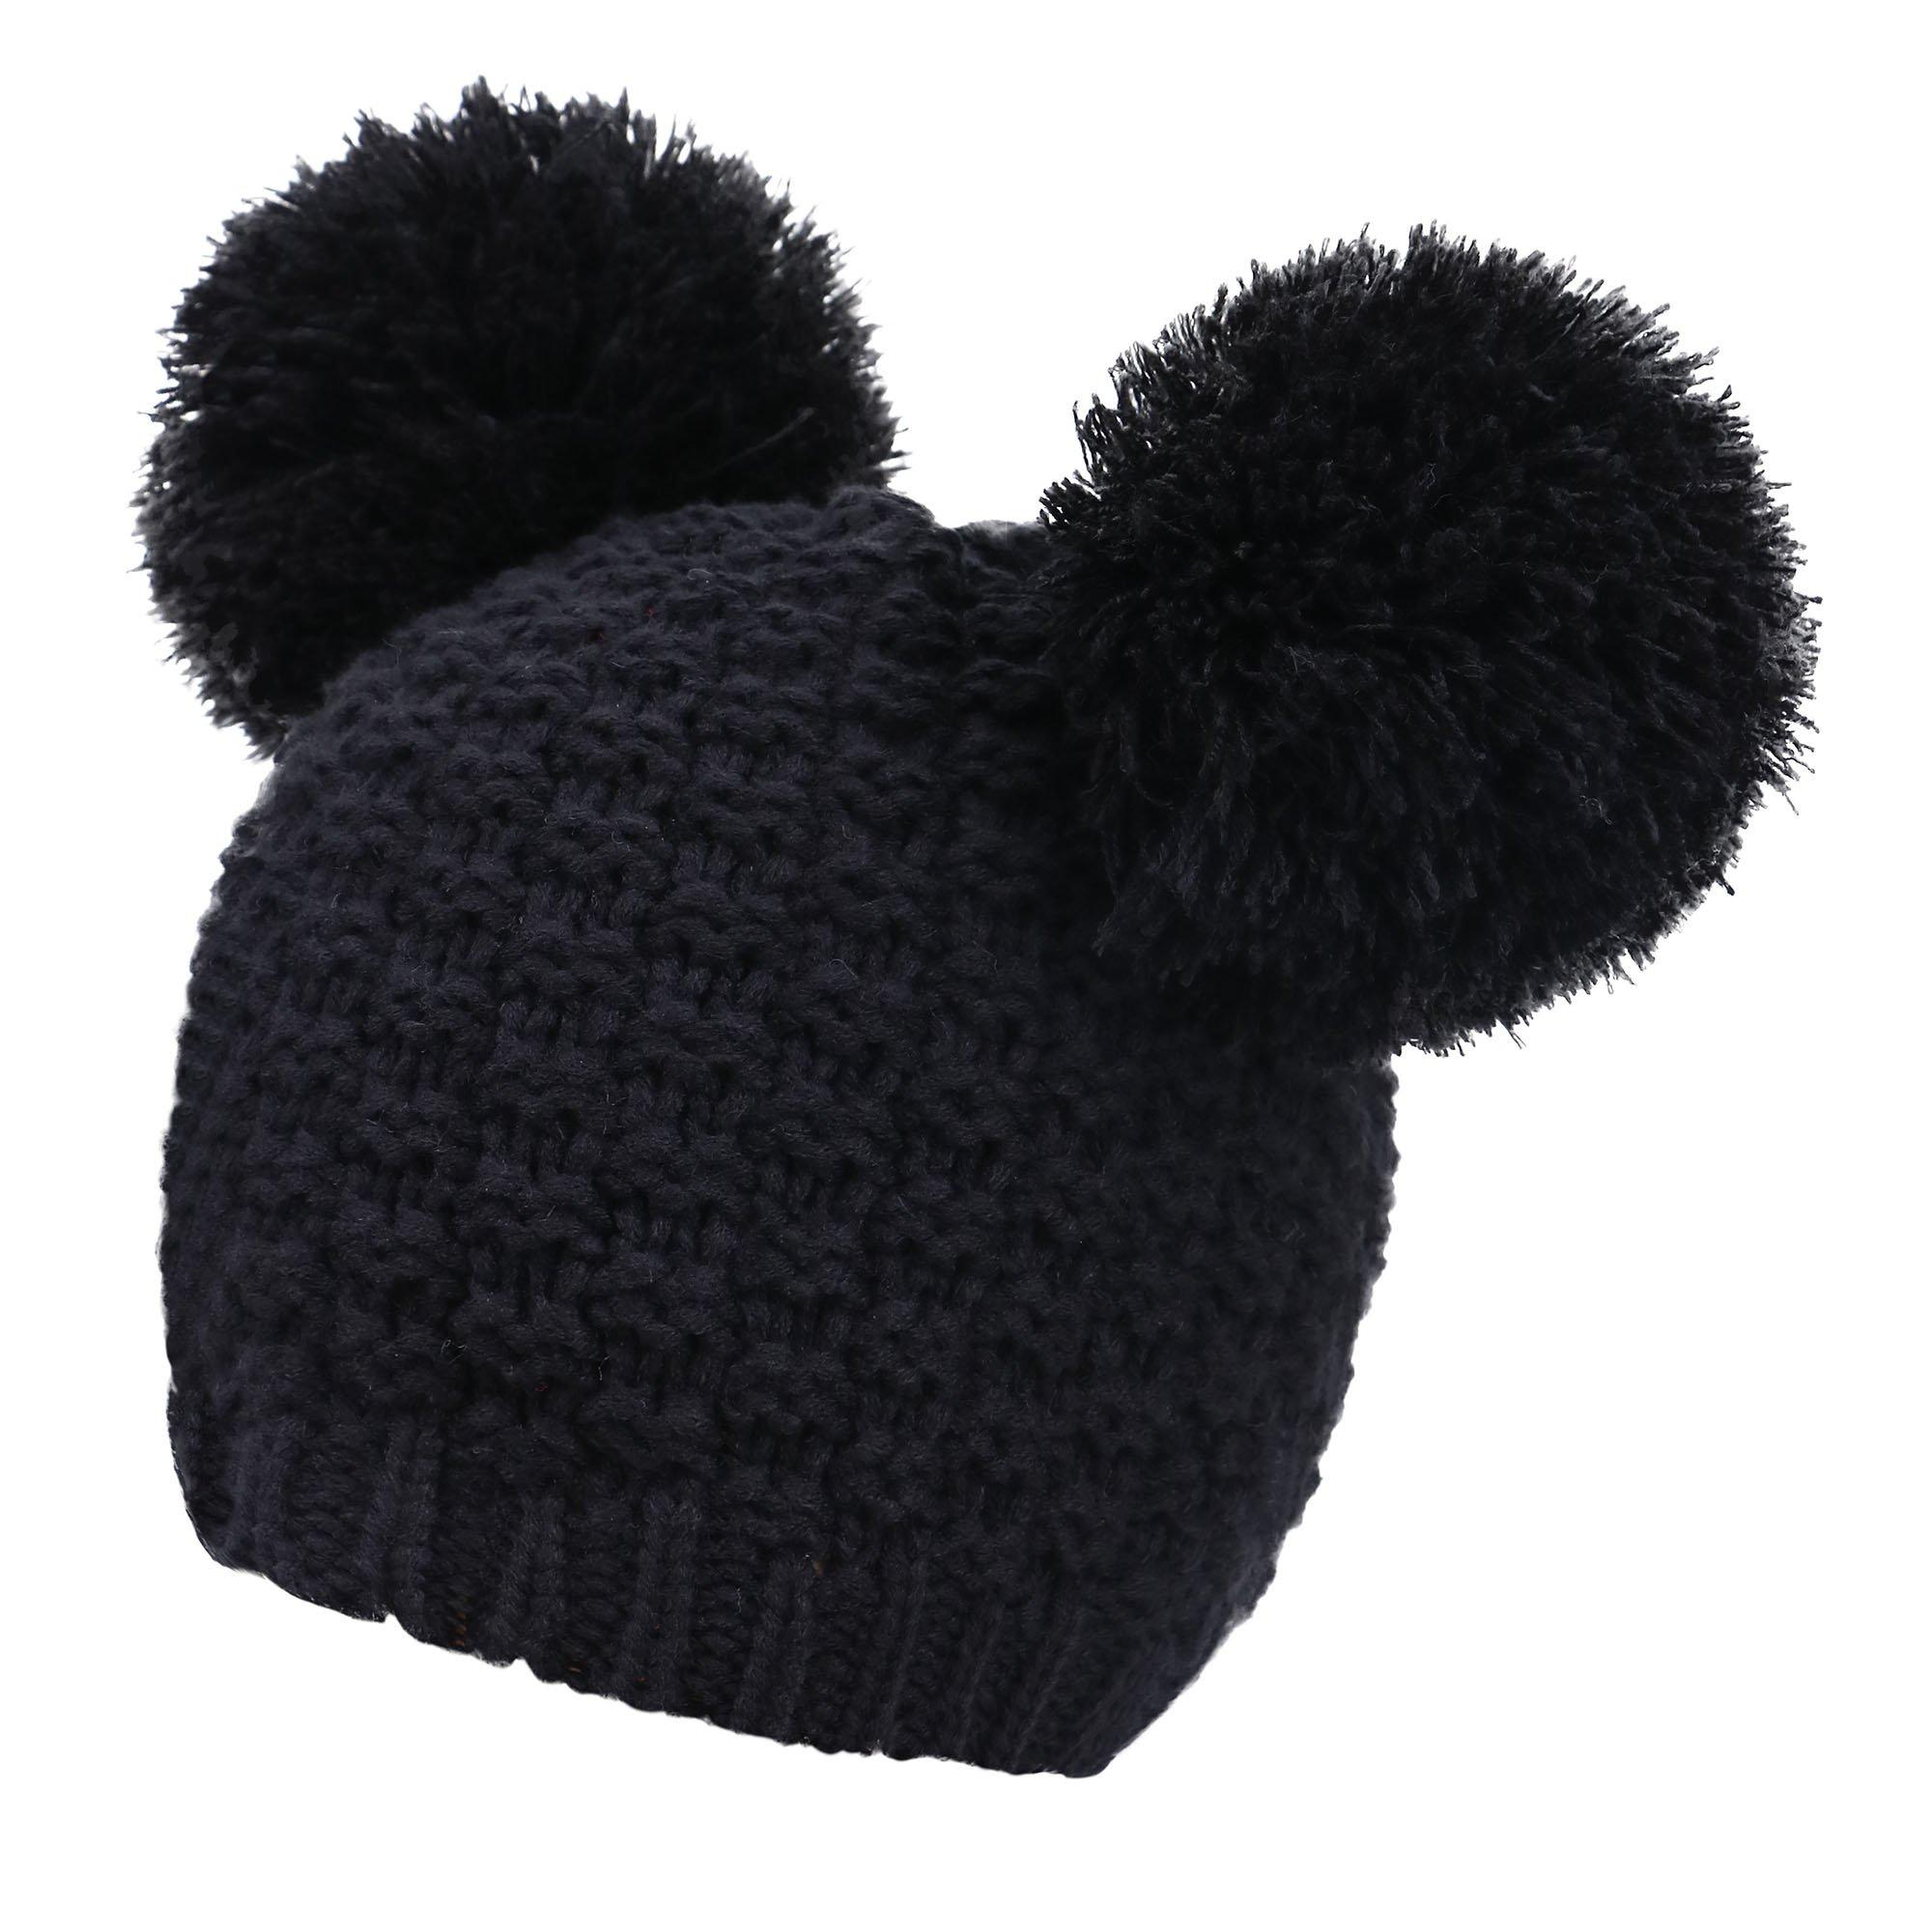 24a0594fefffc2 Details about Women's Winter Chunky Knit Double Pom Pom Beanie Hat, Black